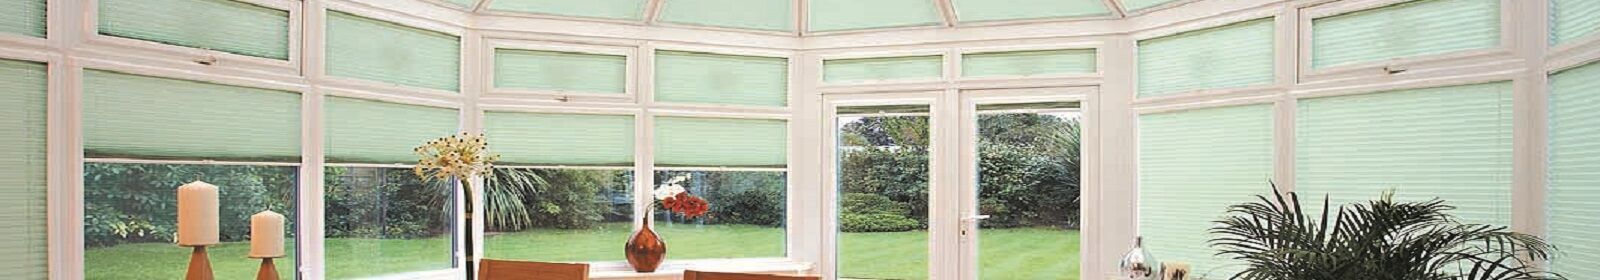 marla conservatory blinds